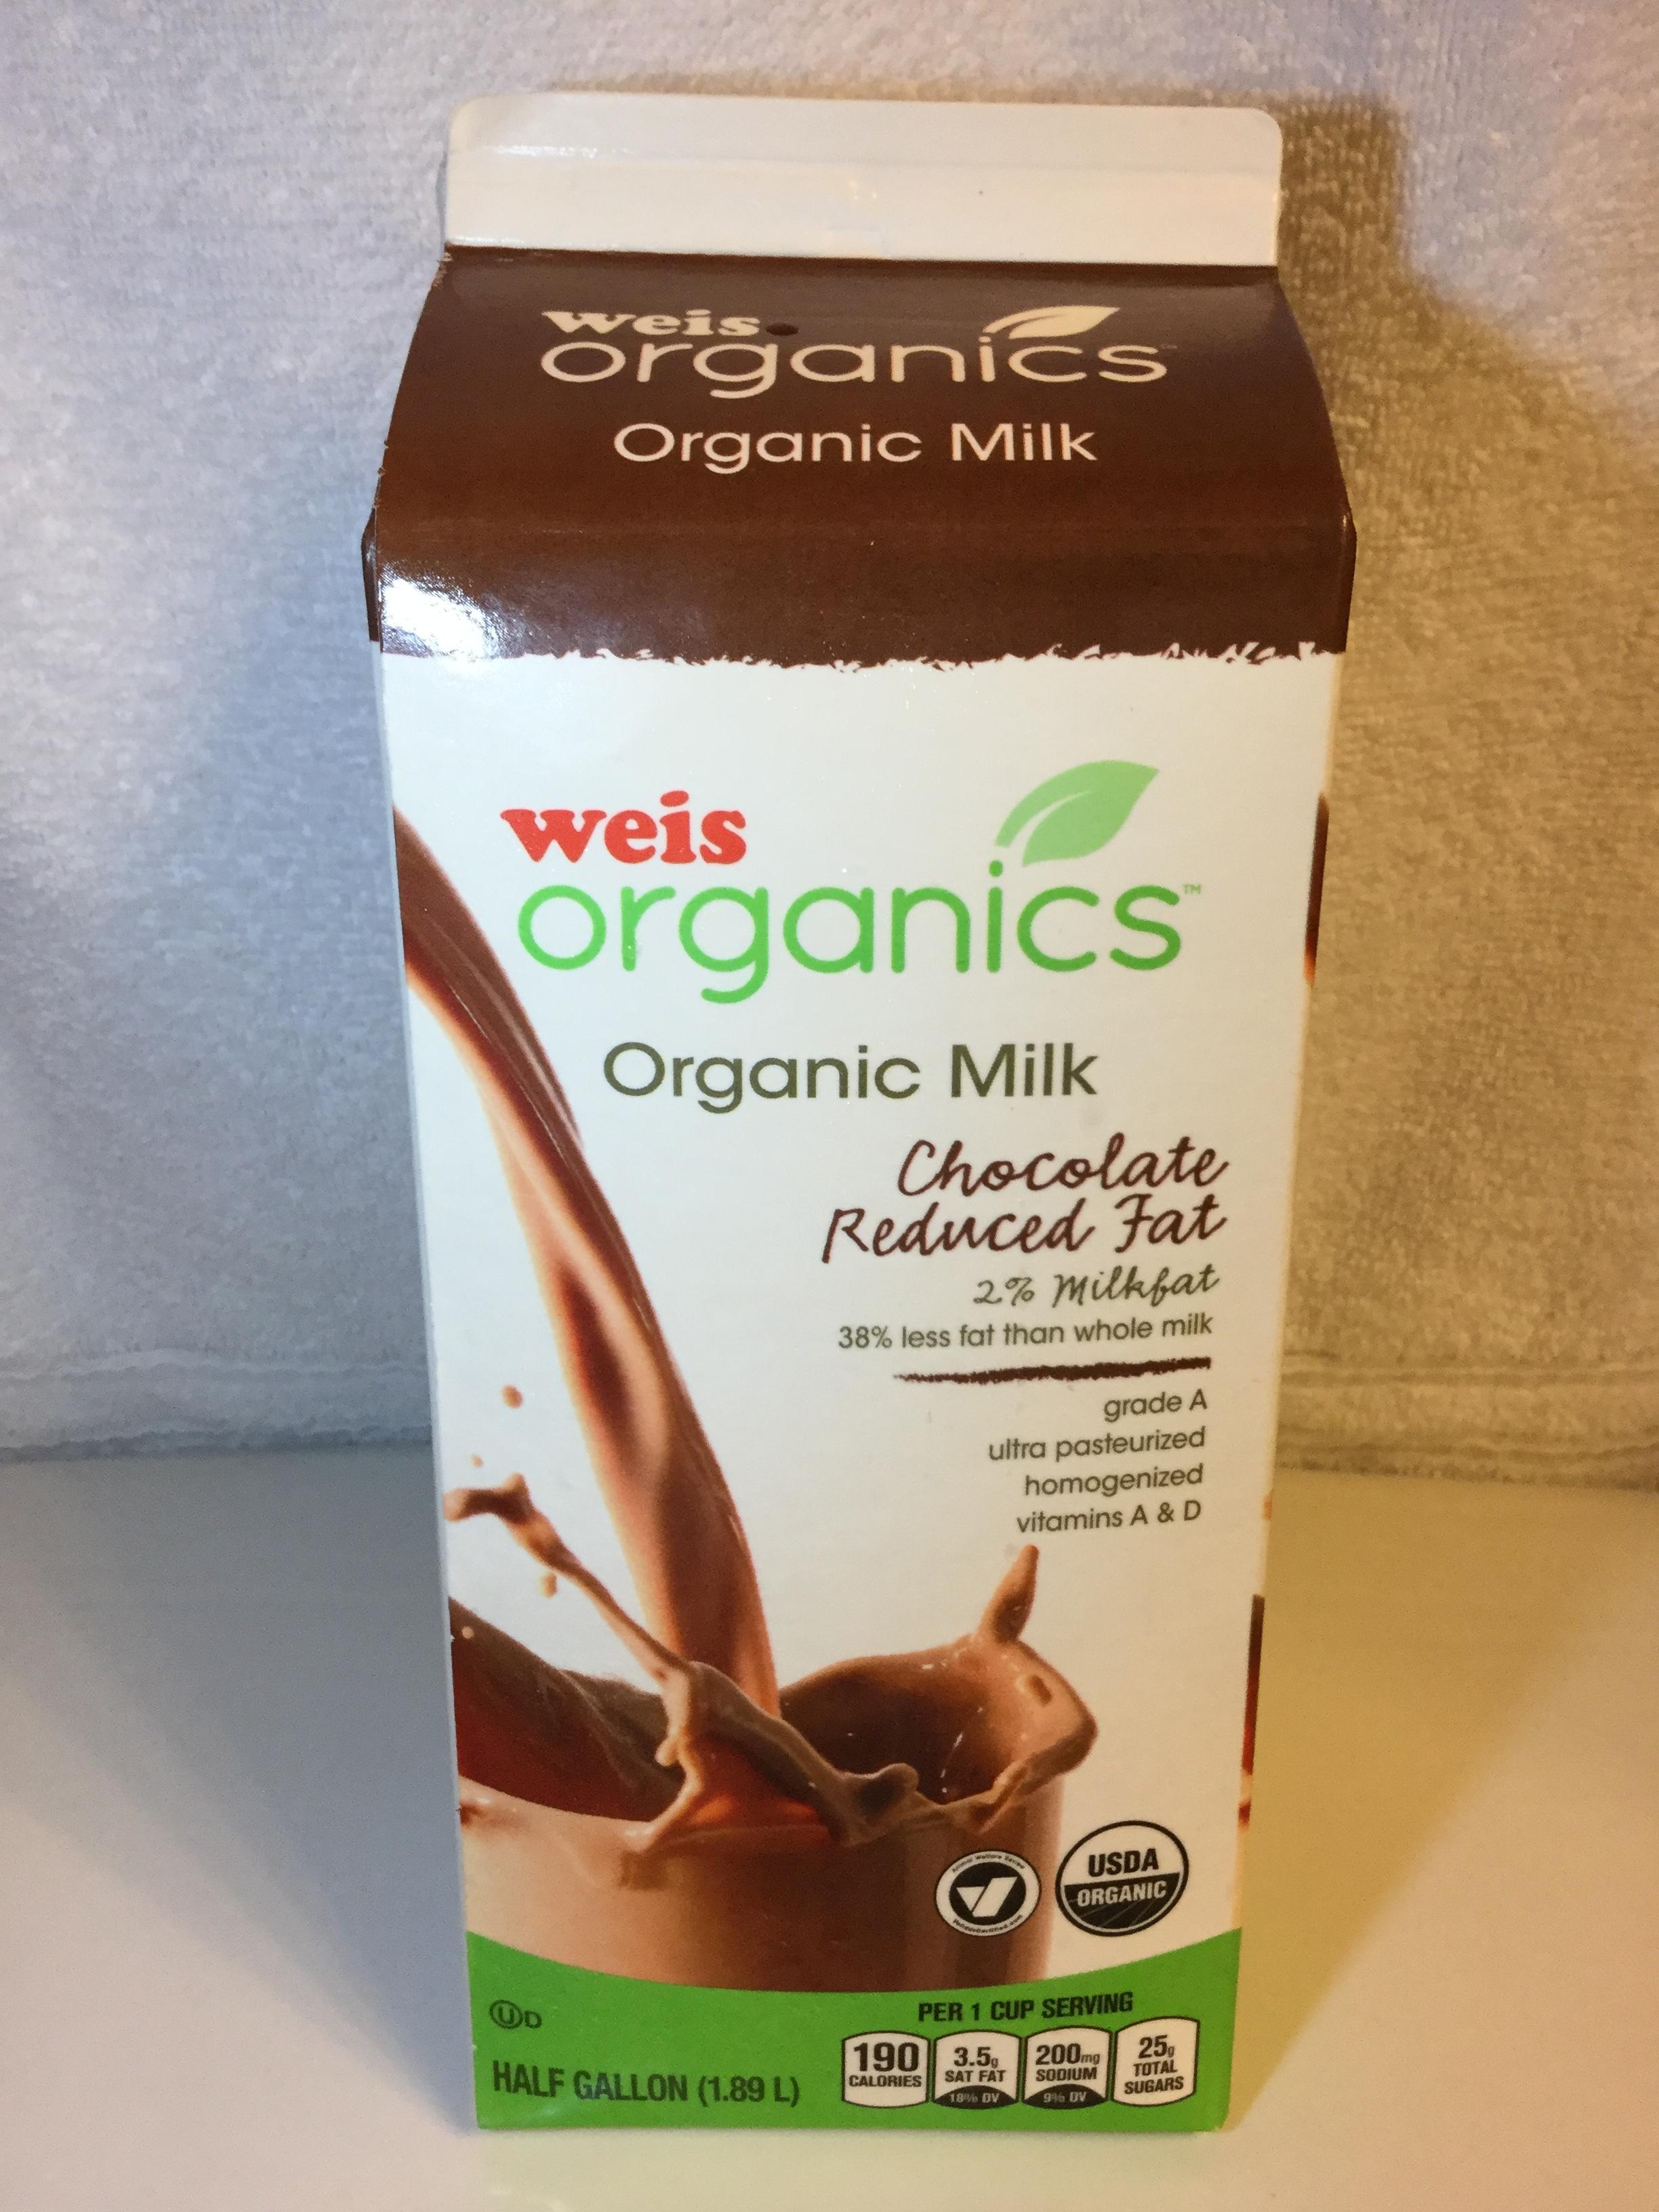 Weis Organics Reduced Fat Chocolate Milk Side 2